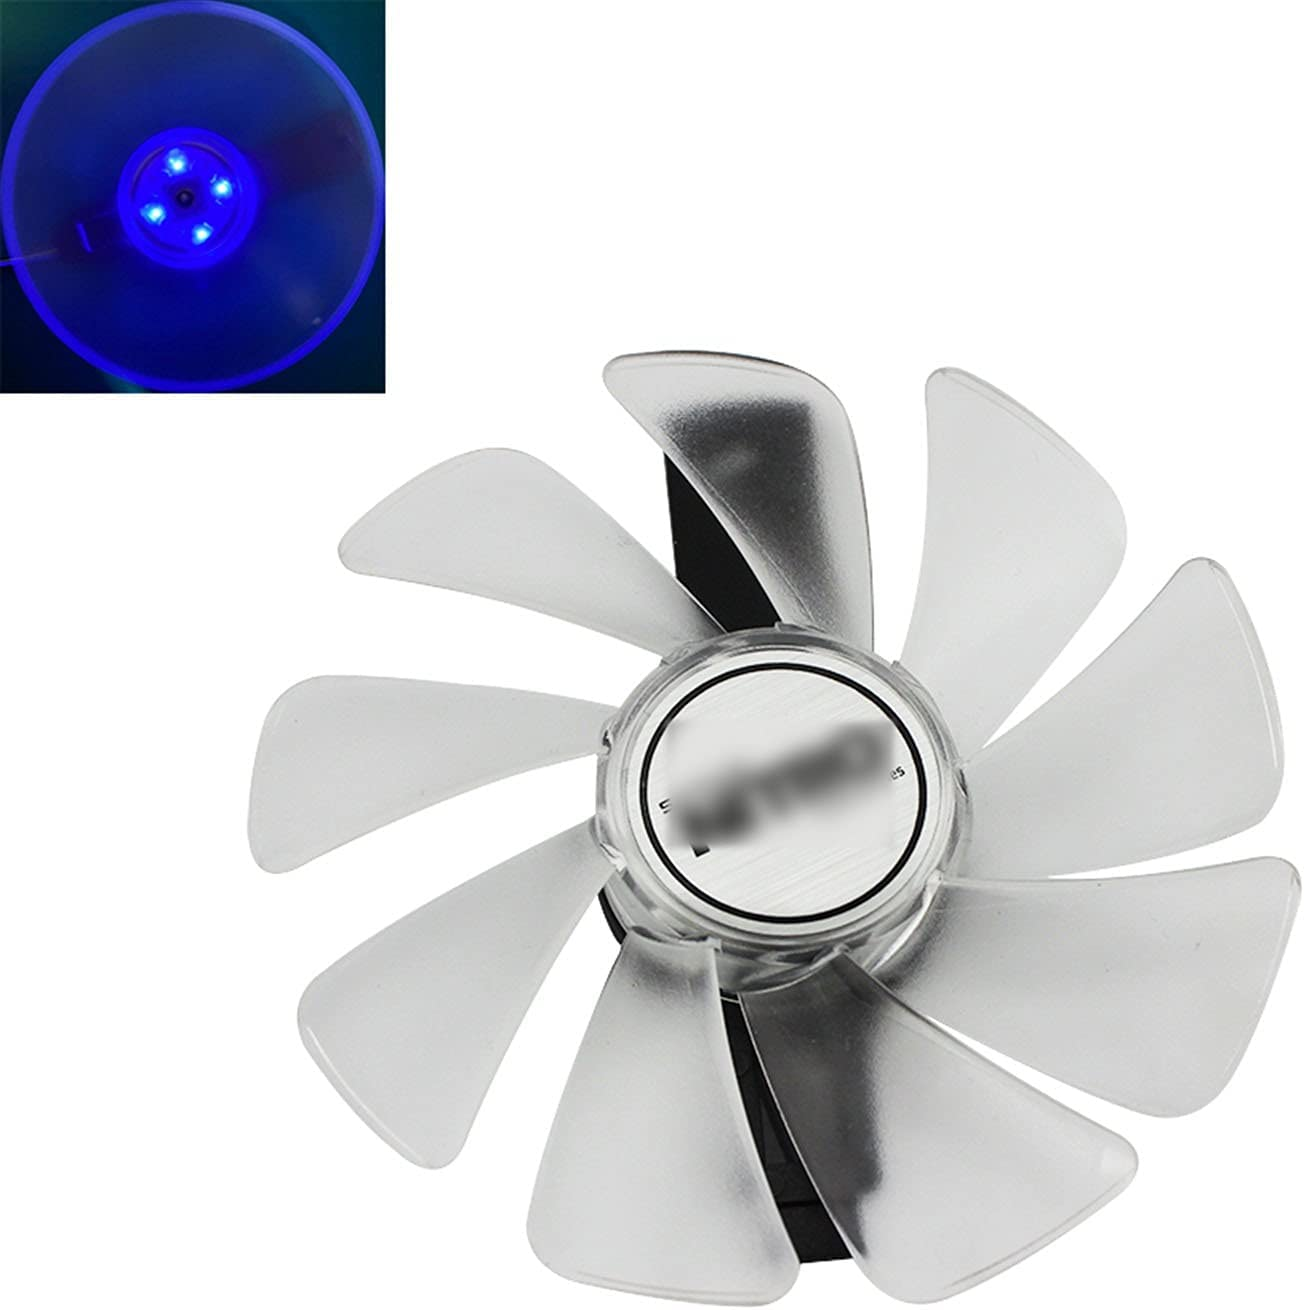 CF1015H12D FD10015M12D RX 590 580 480 470 570 GPU Fan del refrigerador para Sapphire RX470 RX590 RX580 RX480 RX570 Ventilador de especialización de Nitro (Blade Color : Blue LED)